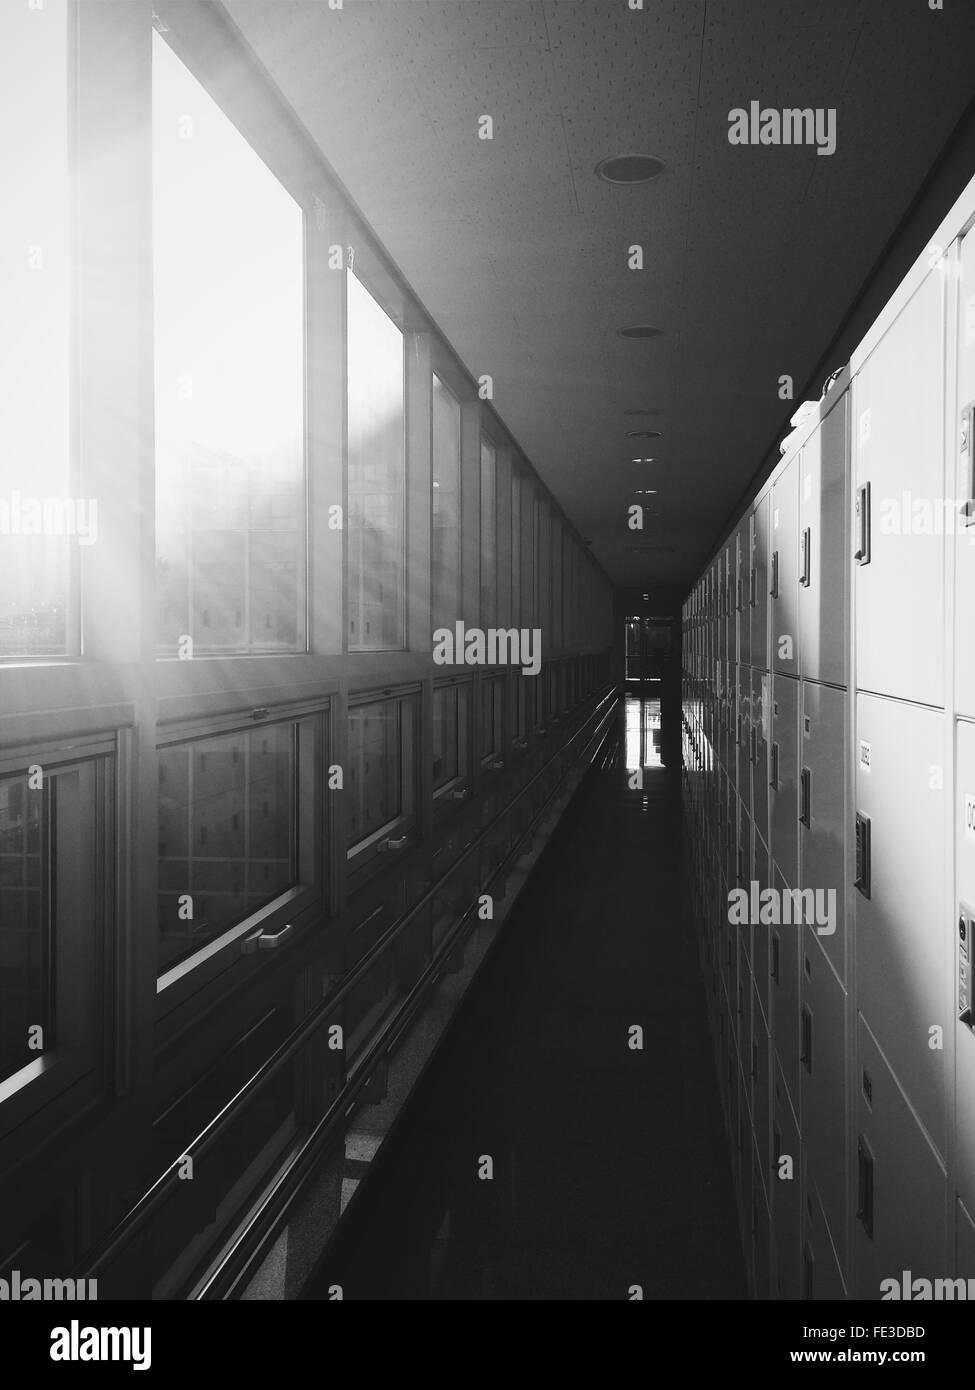 Sunlight Falling Through Windows In Building - Stock Image